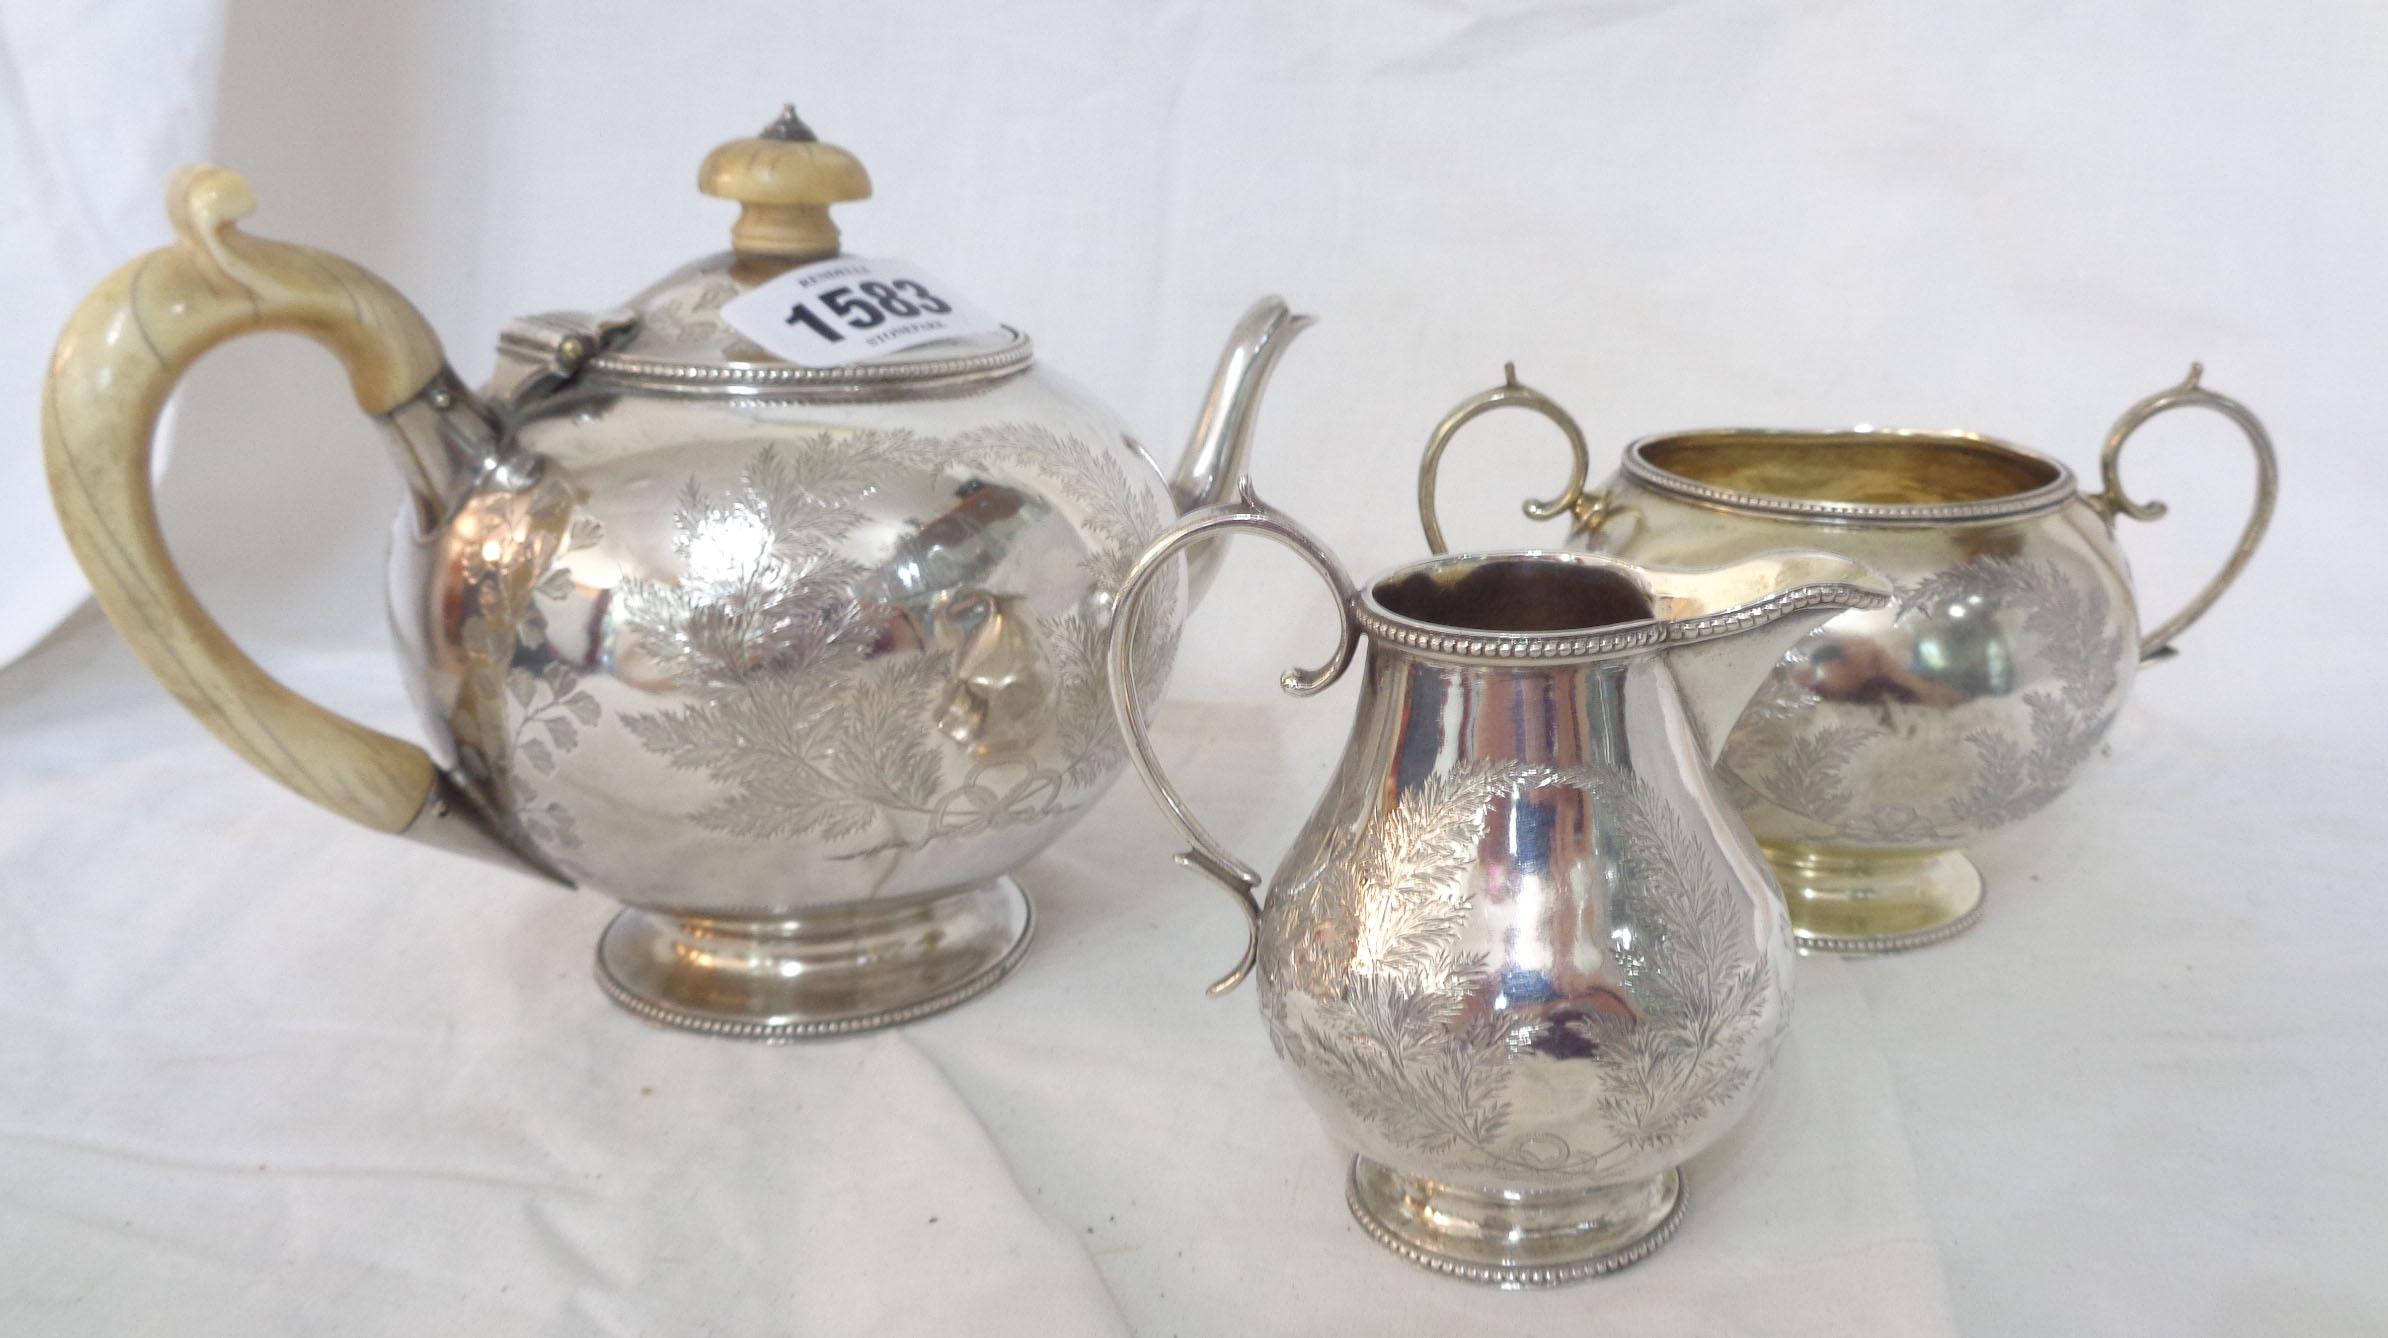 A Victorian silver three piece tea set of globular form with engraved fern decoration - London